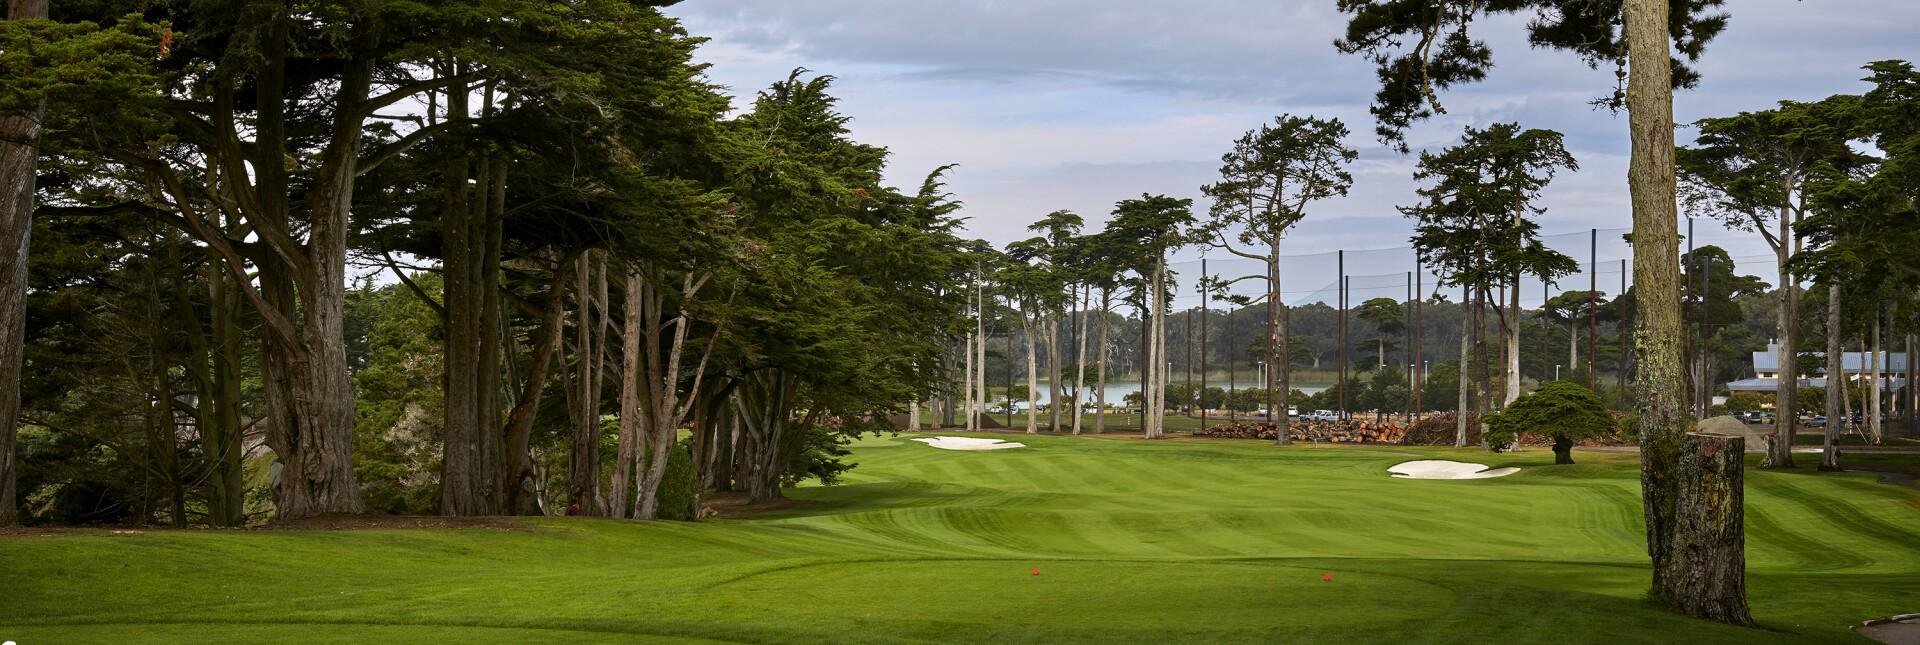 2020 PGA Championship - Previews